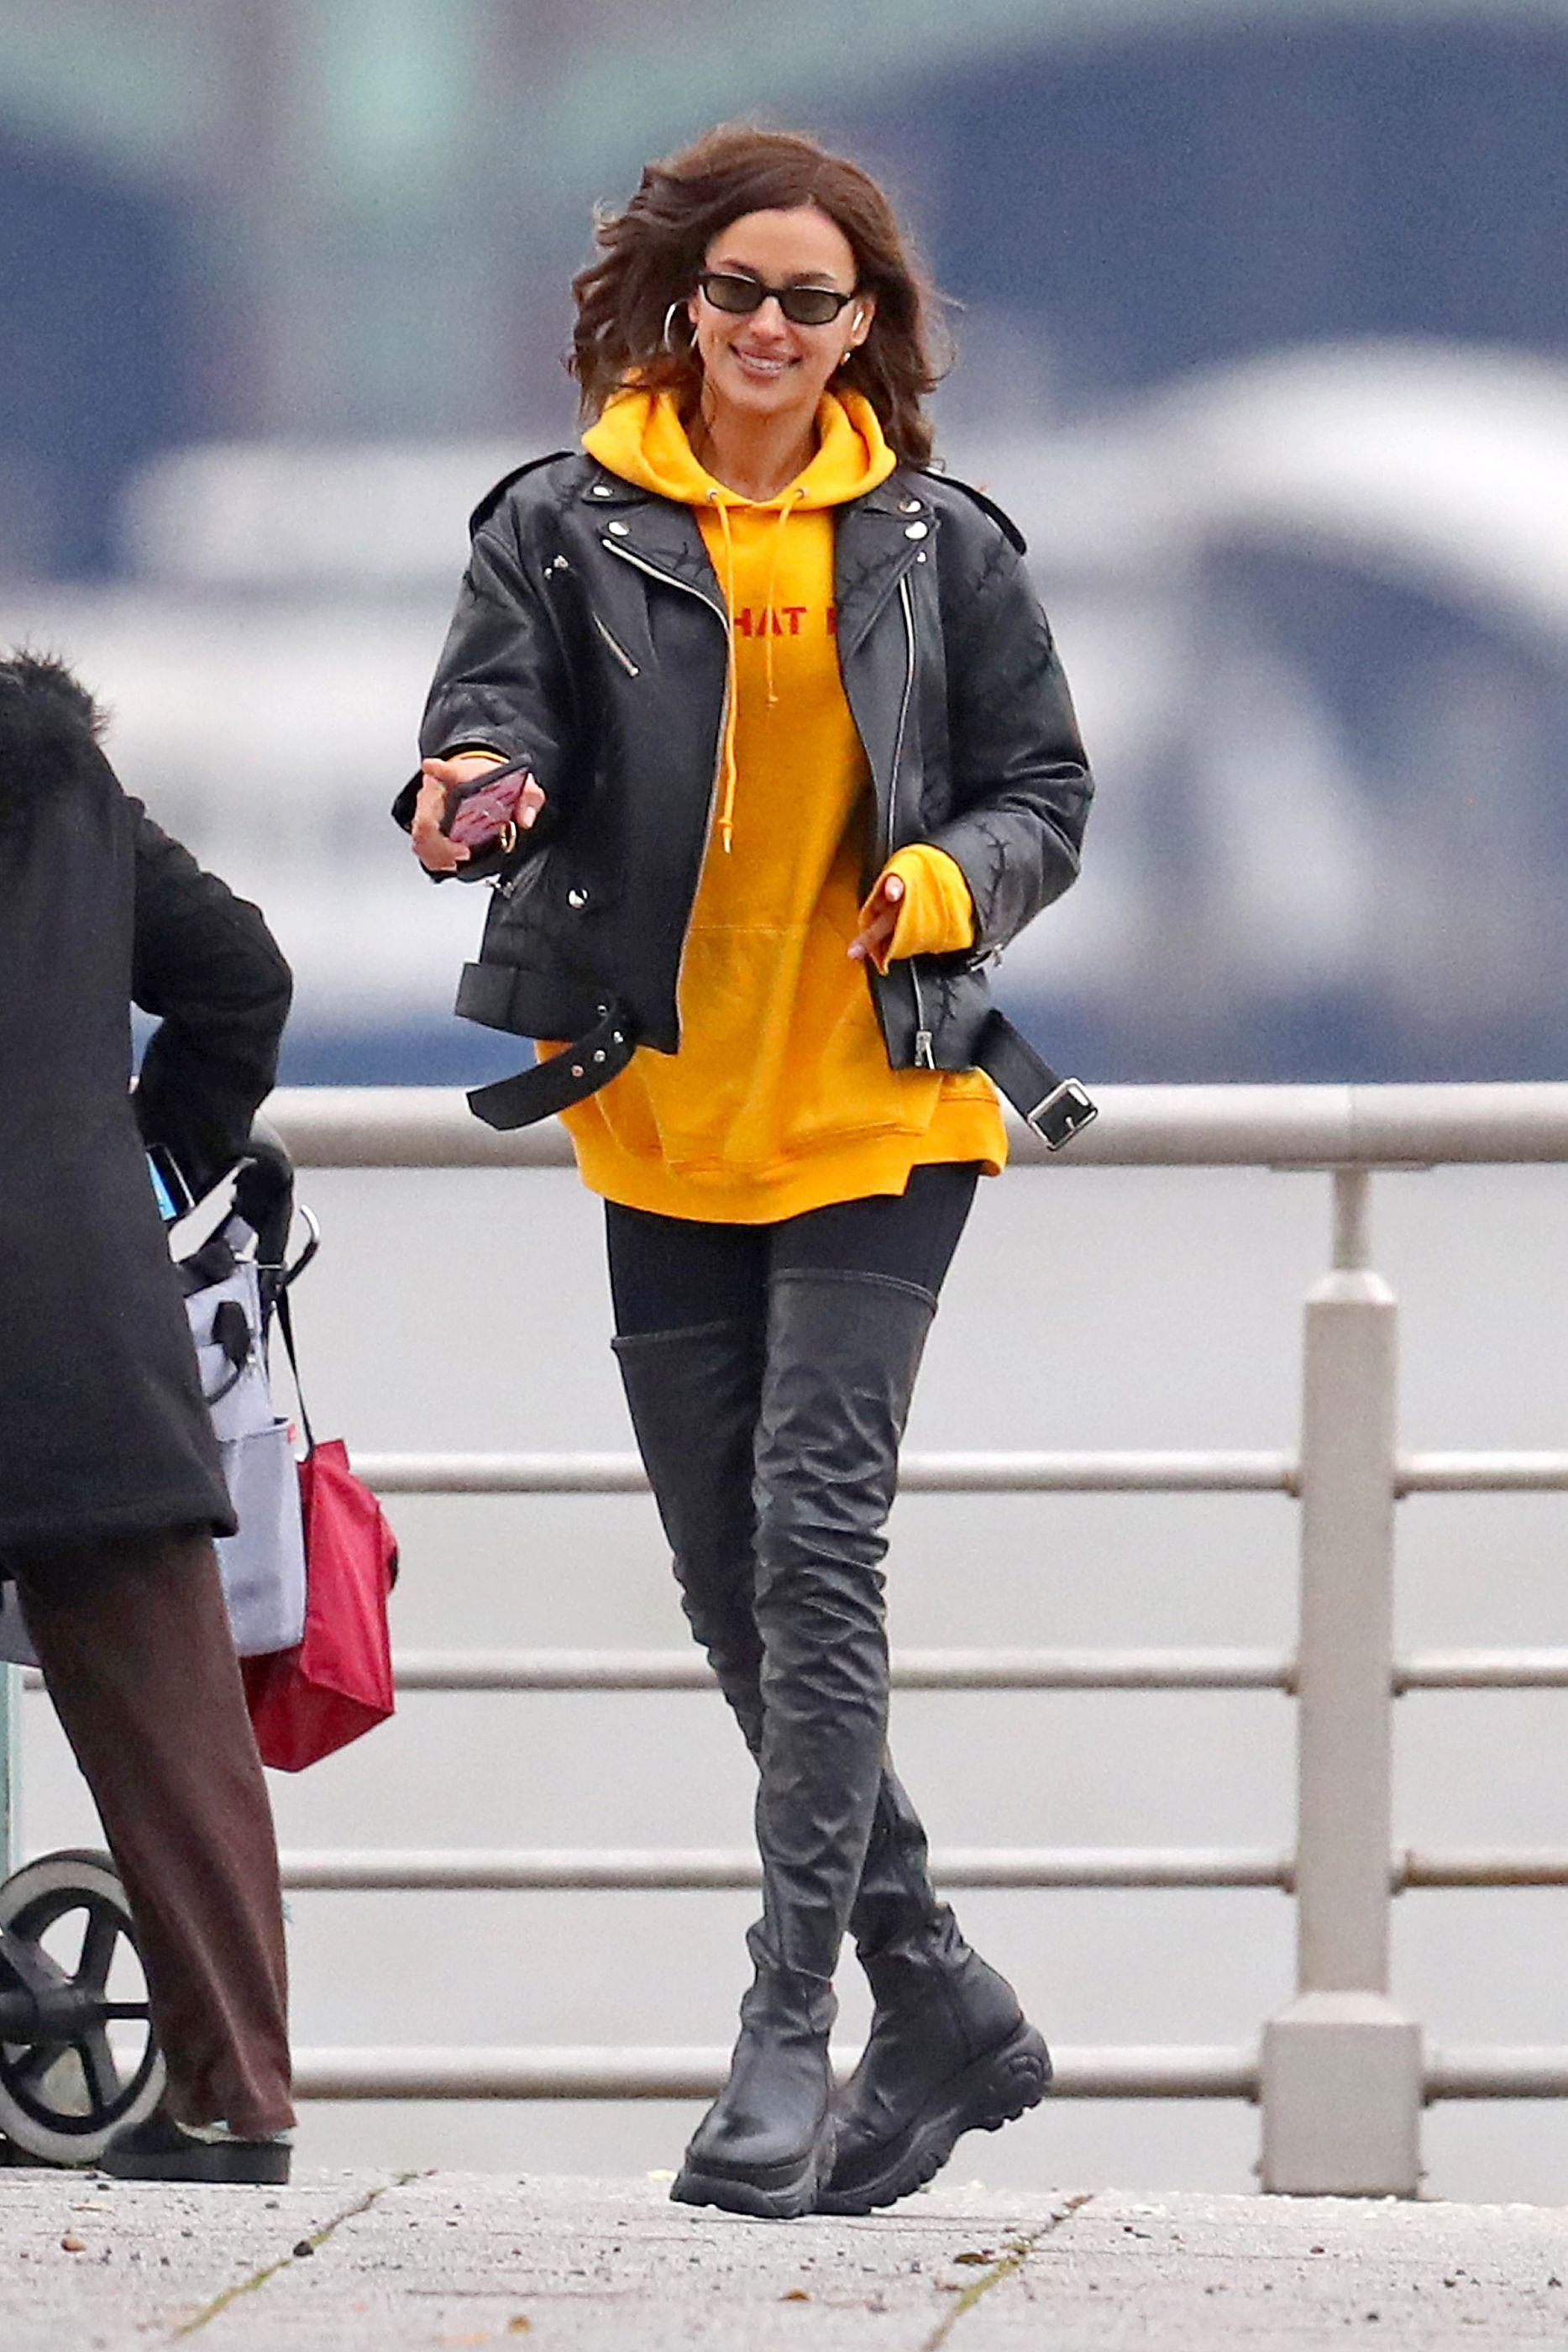 Irina Shayk out in NYC